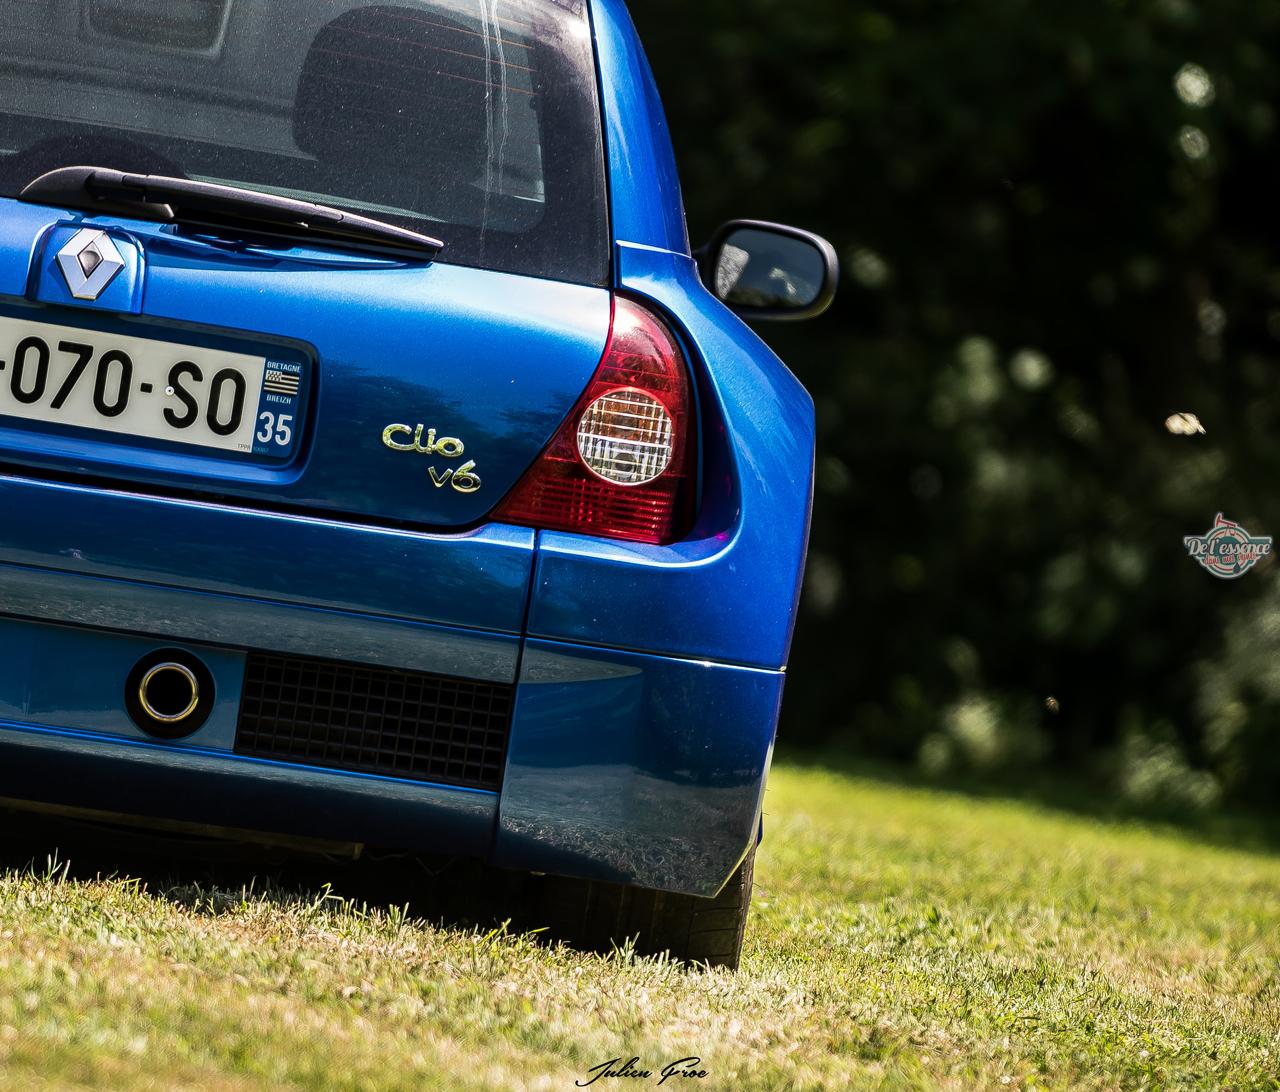 DLEDMV - Renault Clio V6 Ph2 JulienF - 06